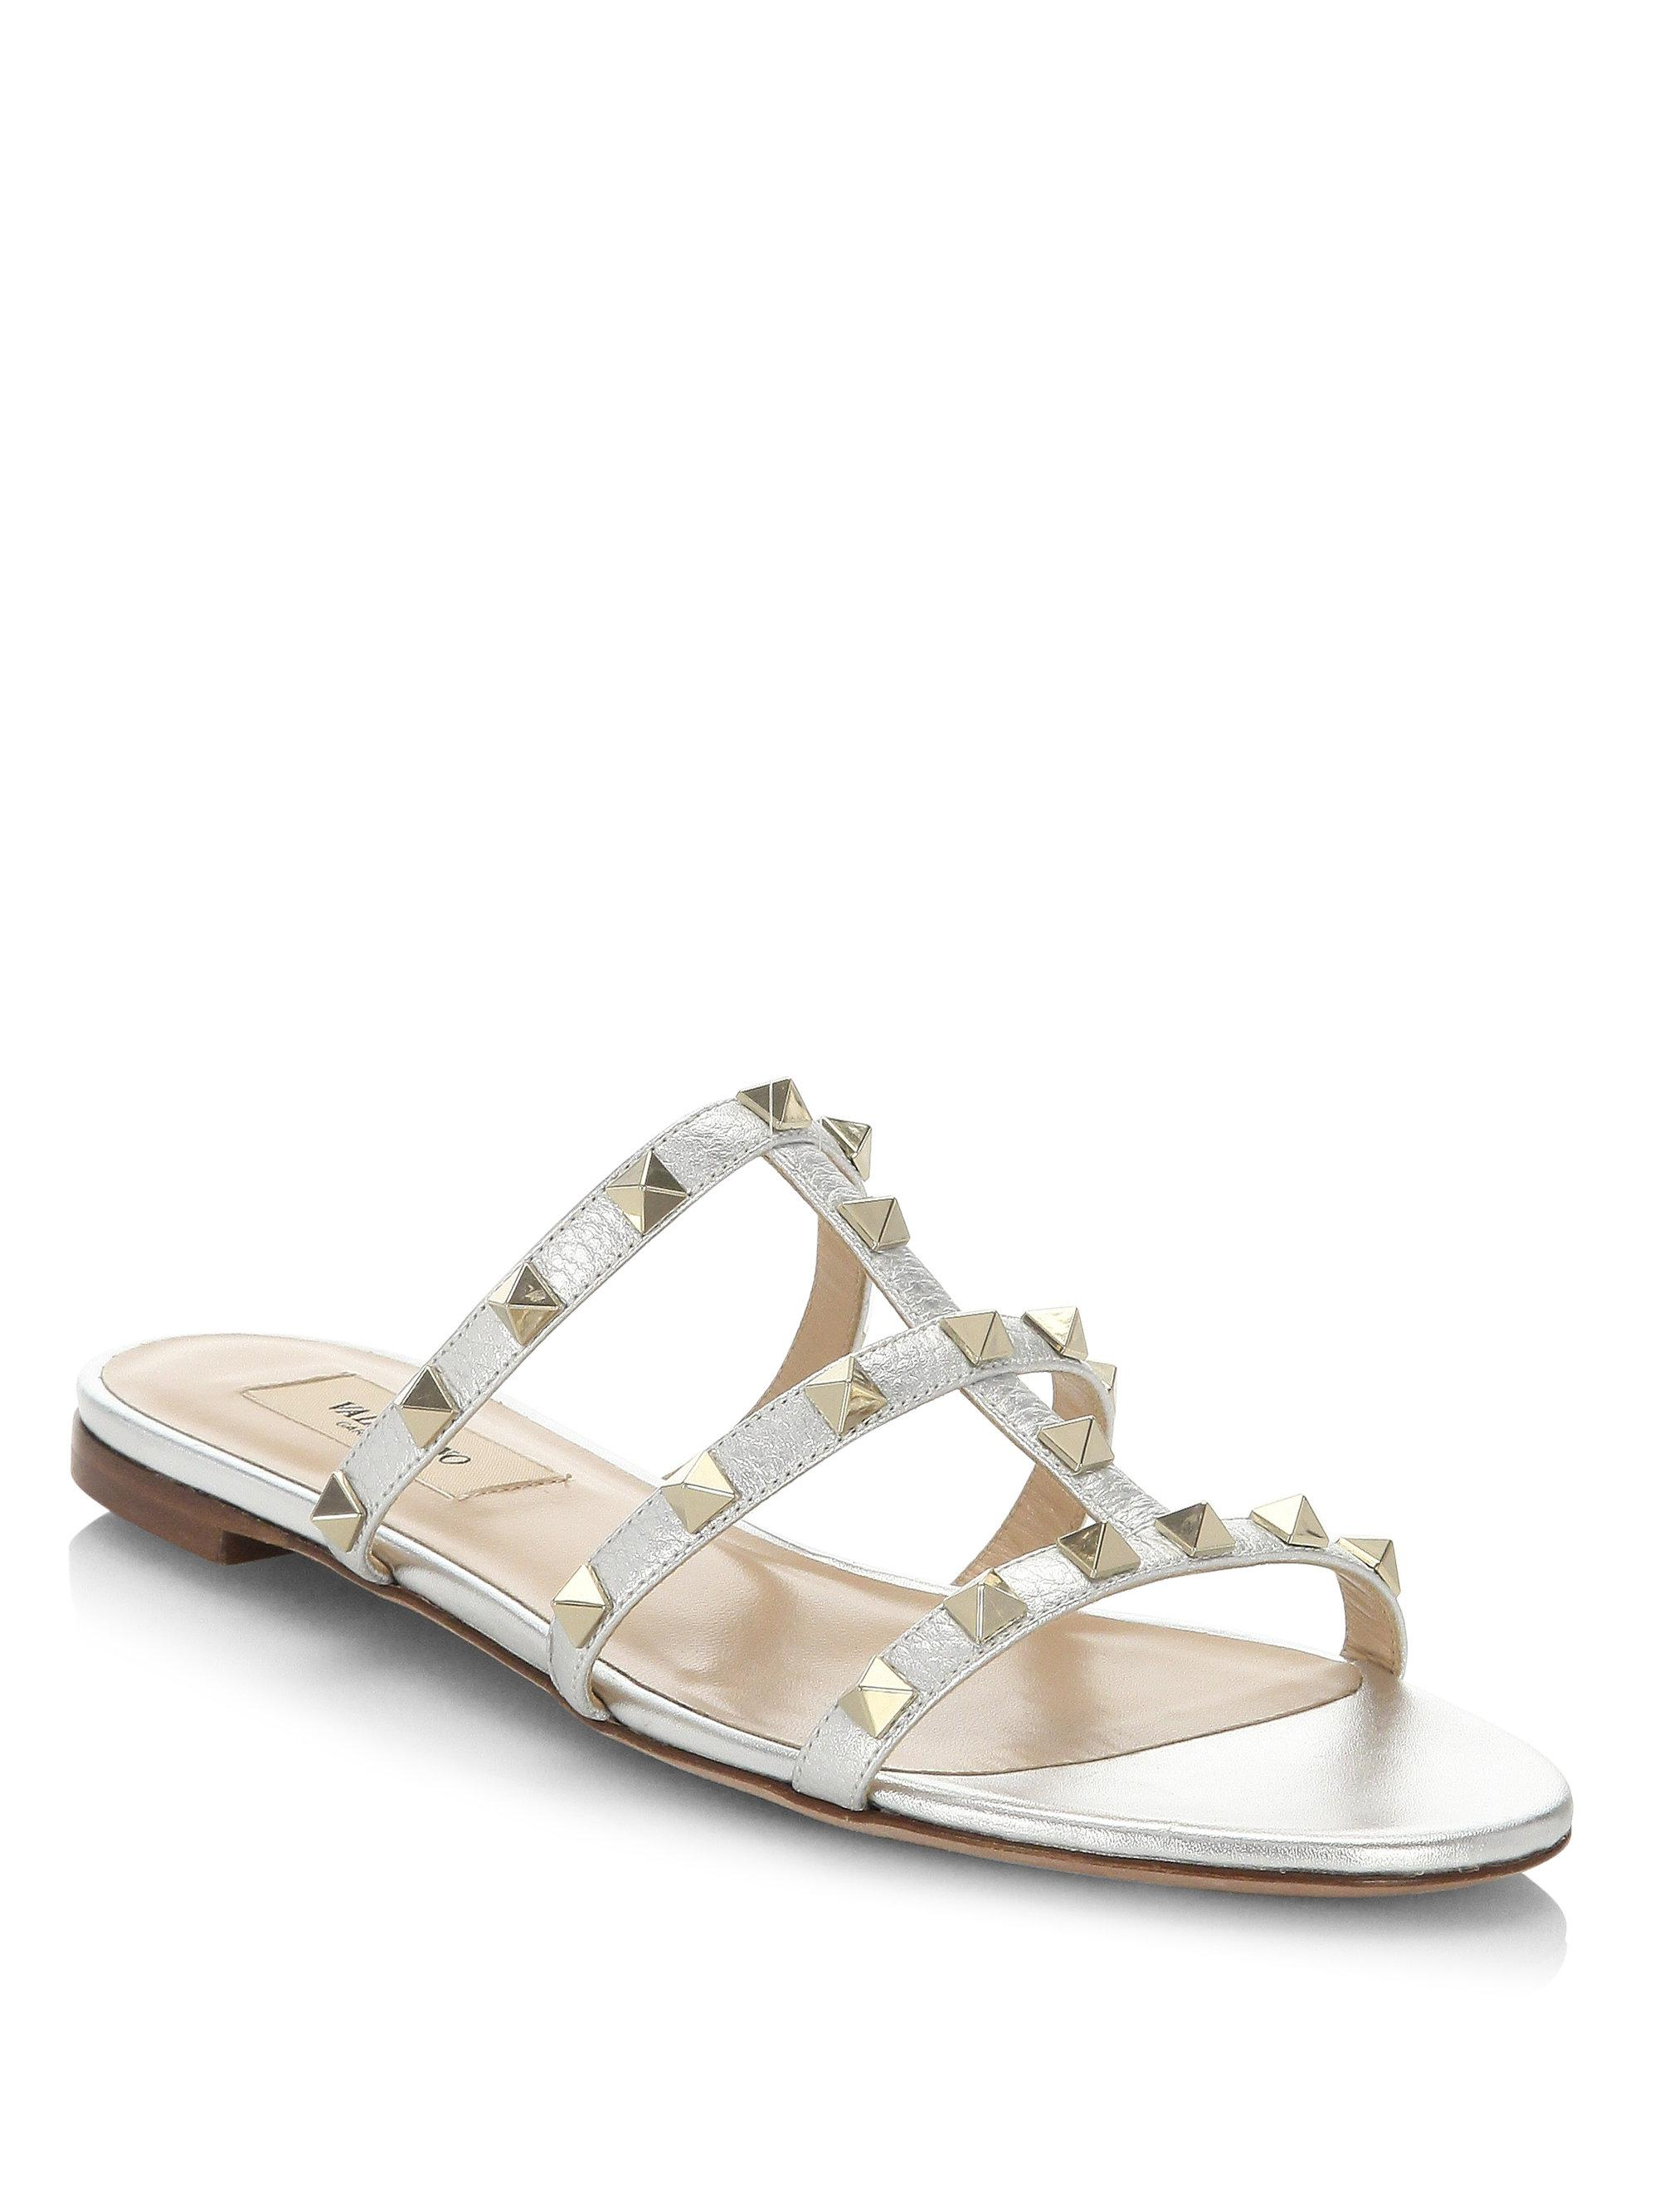 8edb63bed Valentino - Garavani The Rockstud Metallic Textured-leather Sandals - Lyst